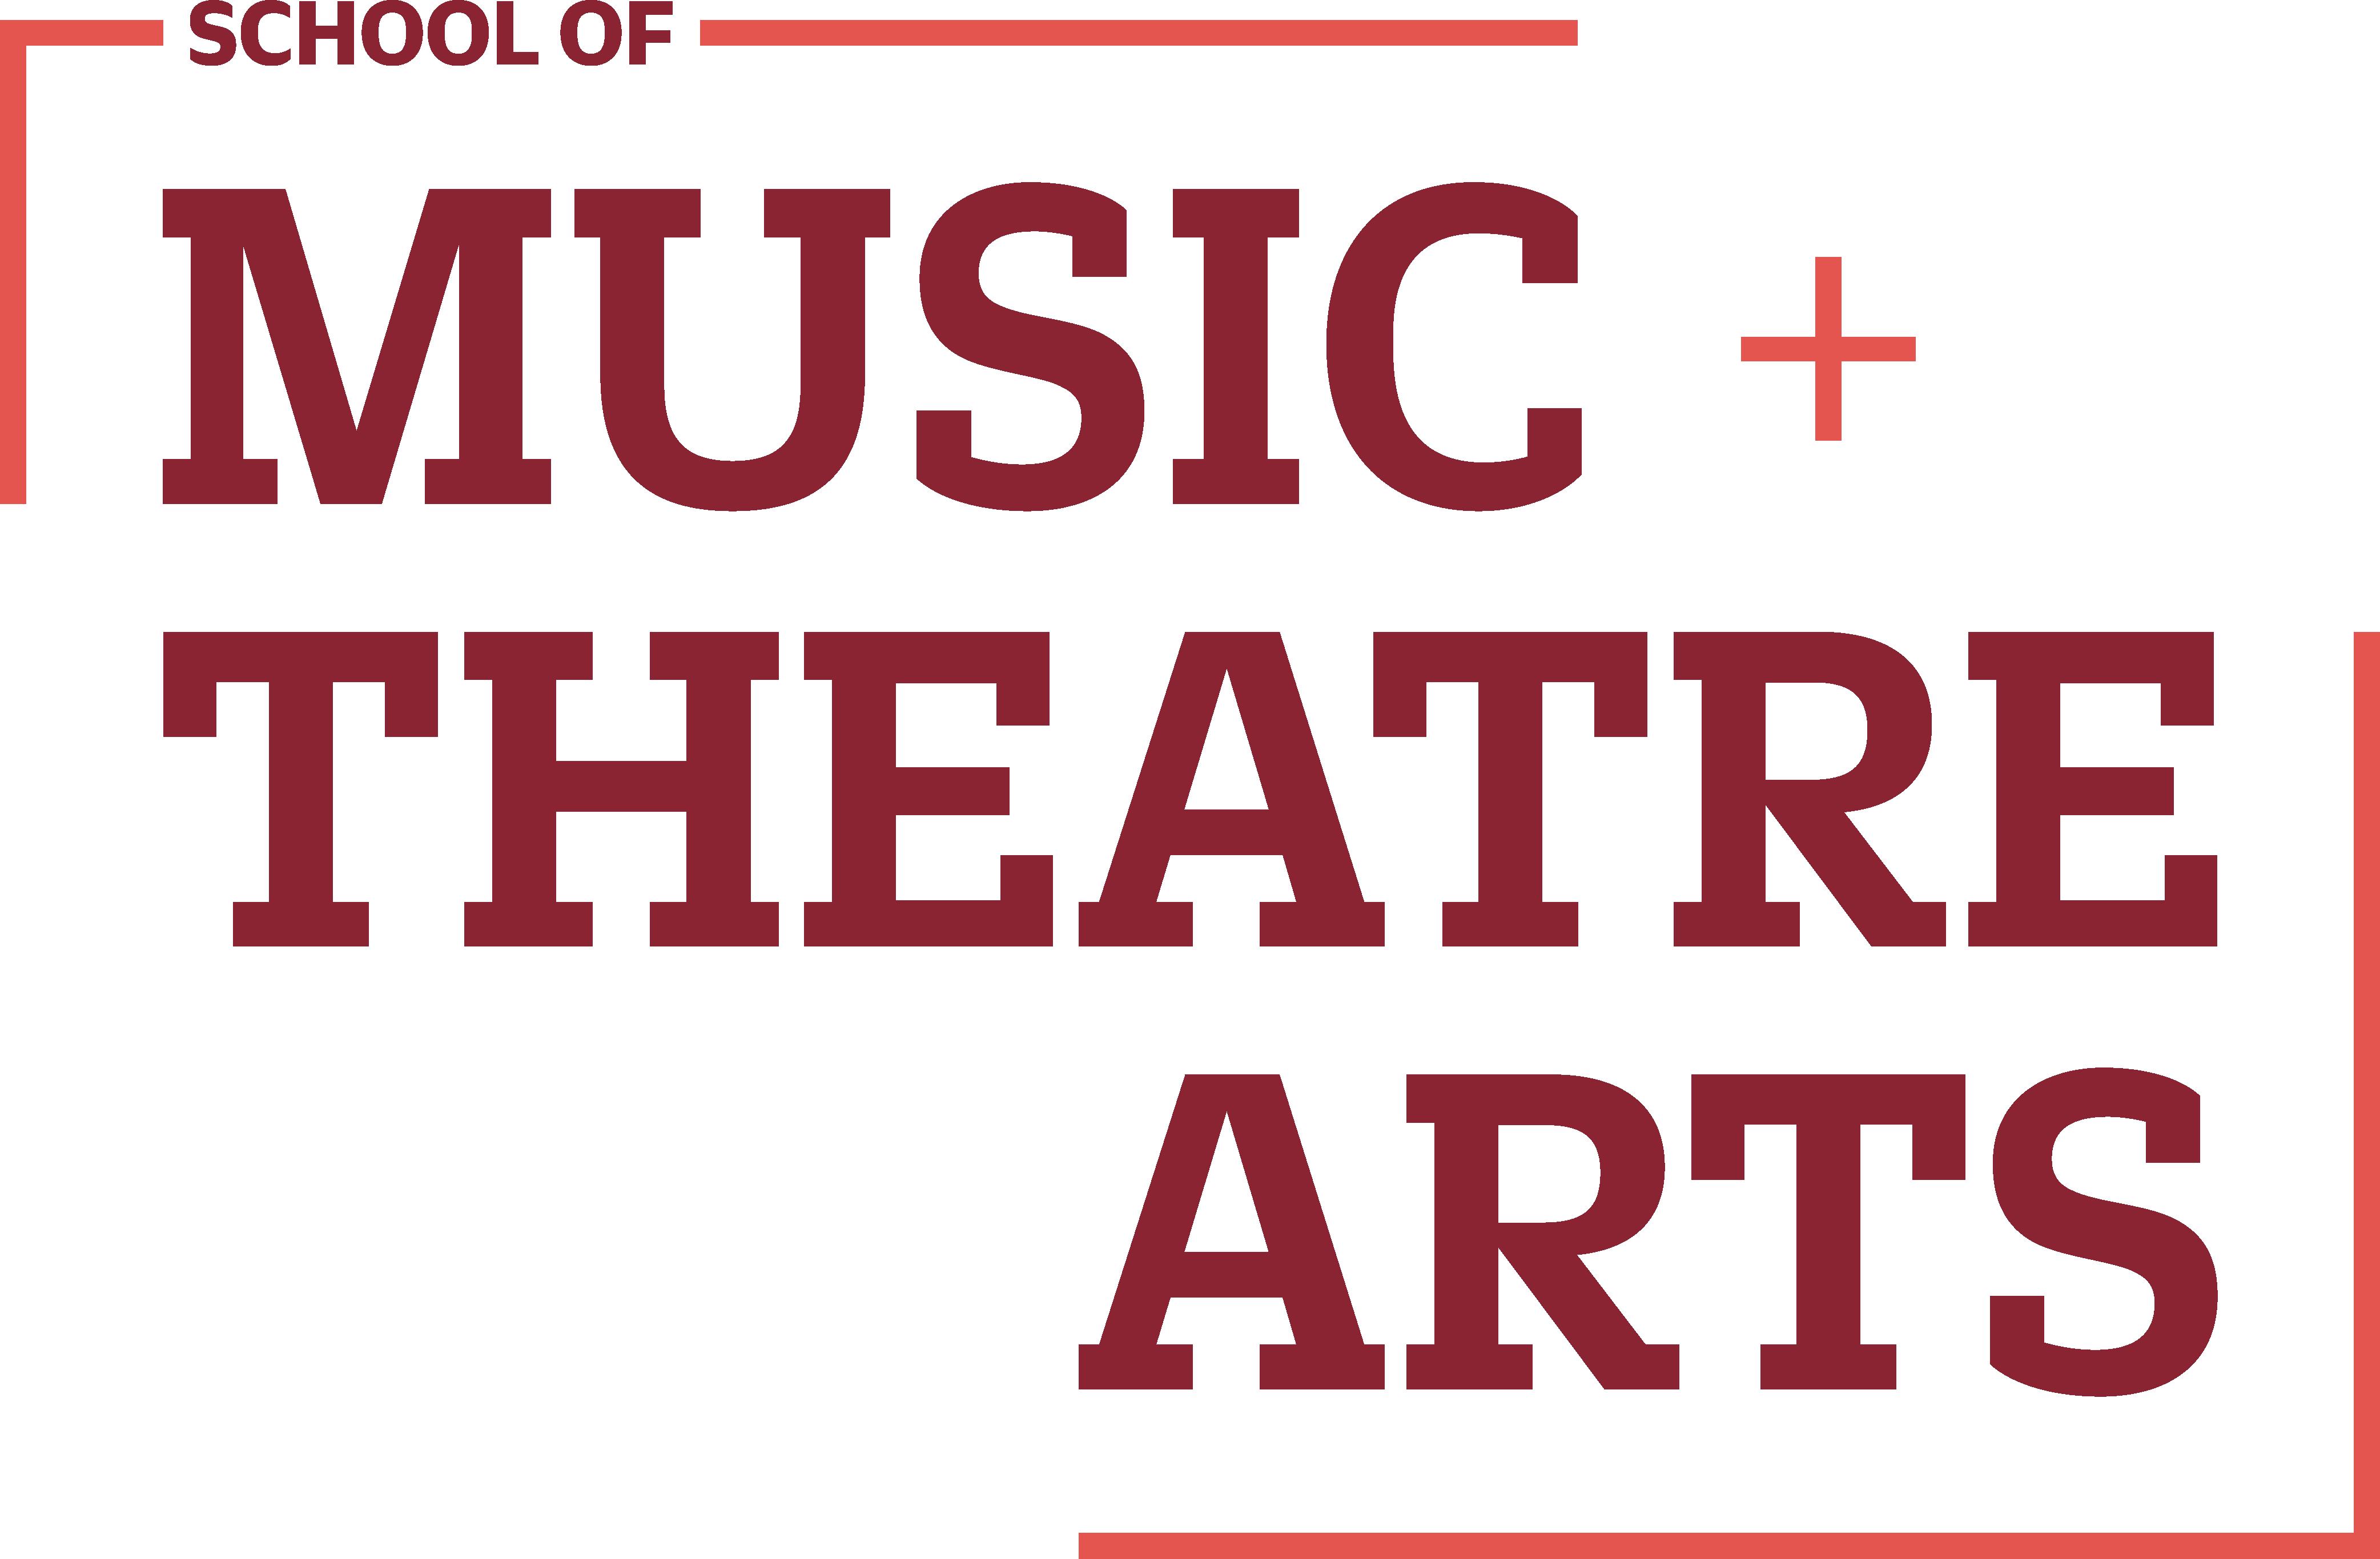 School of Music & Theatre Arts